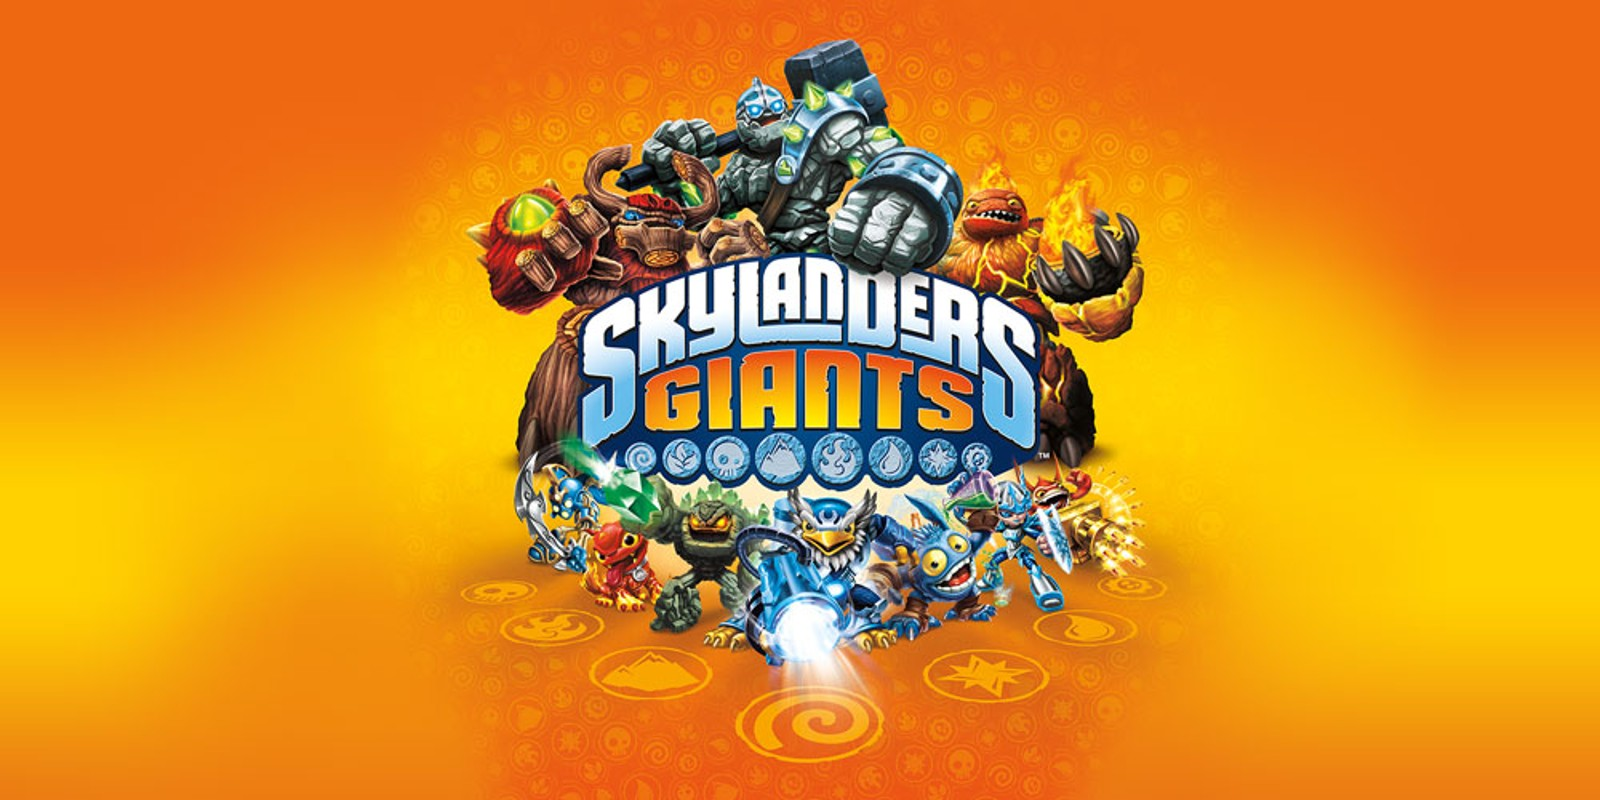 The Legend Of Zelda Wallpaper Hd Skylanders Giants Wii U Spiele Nintendo